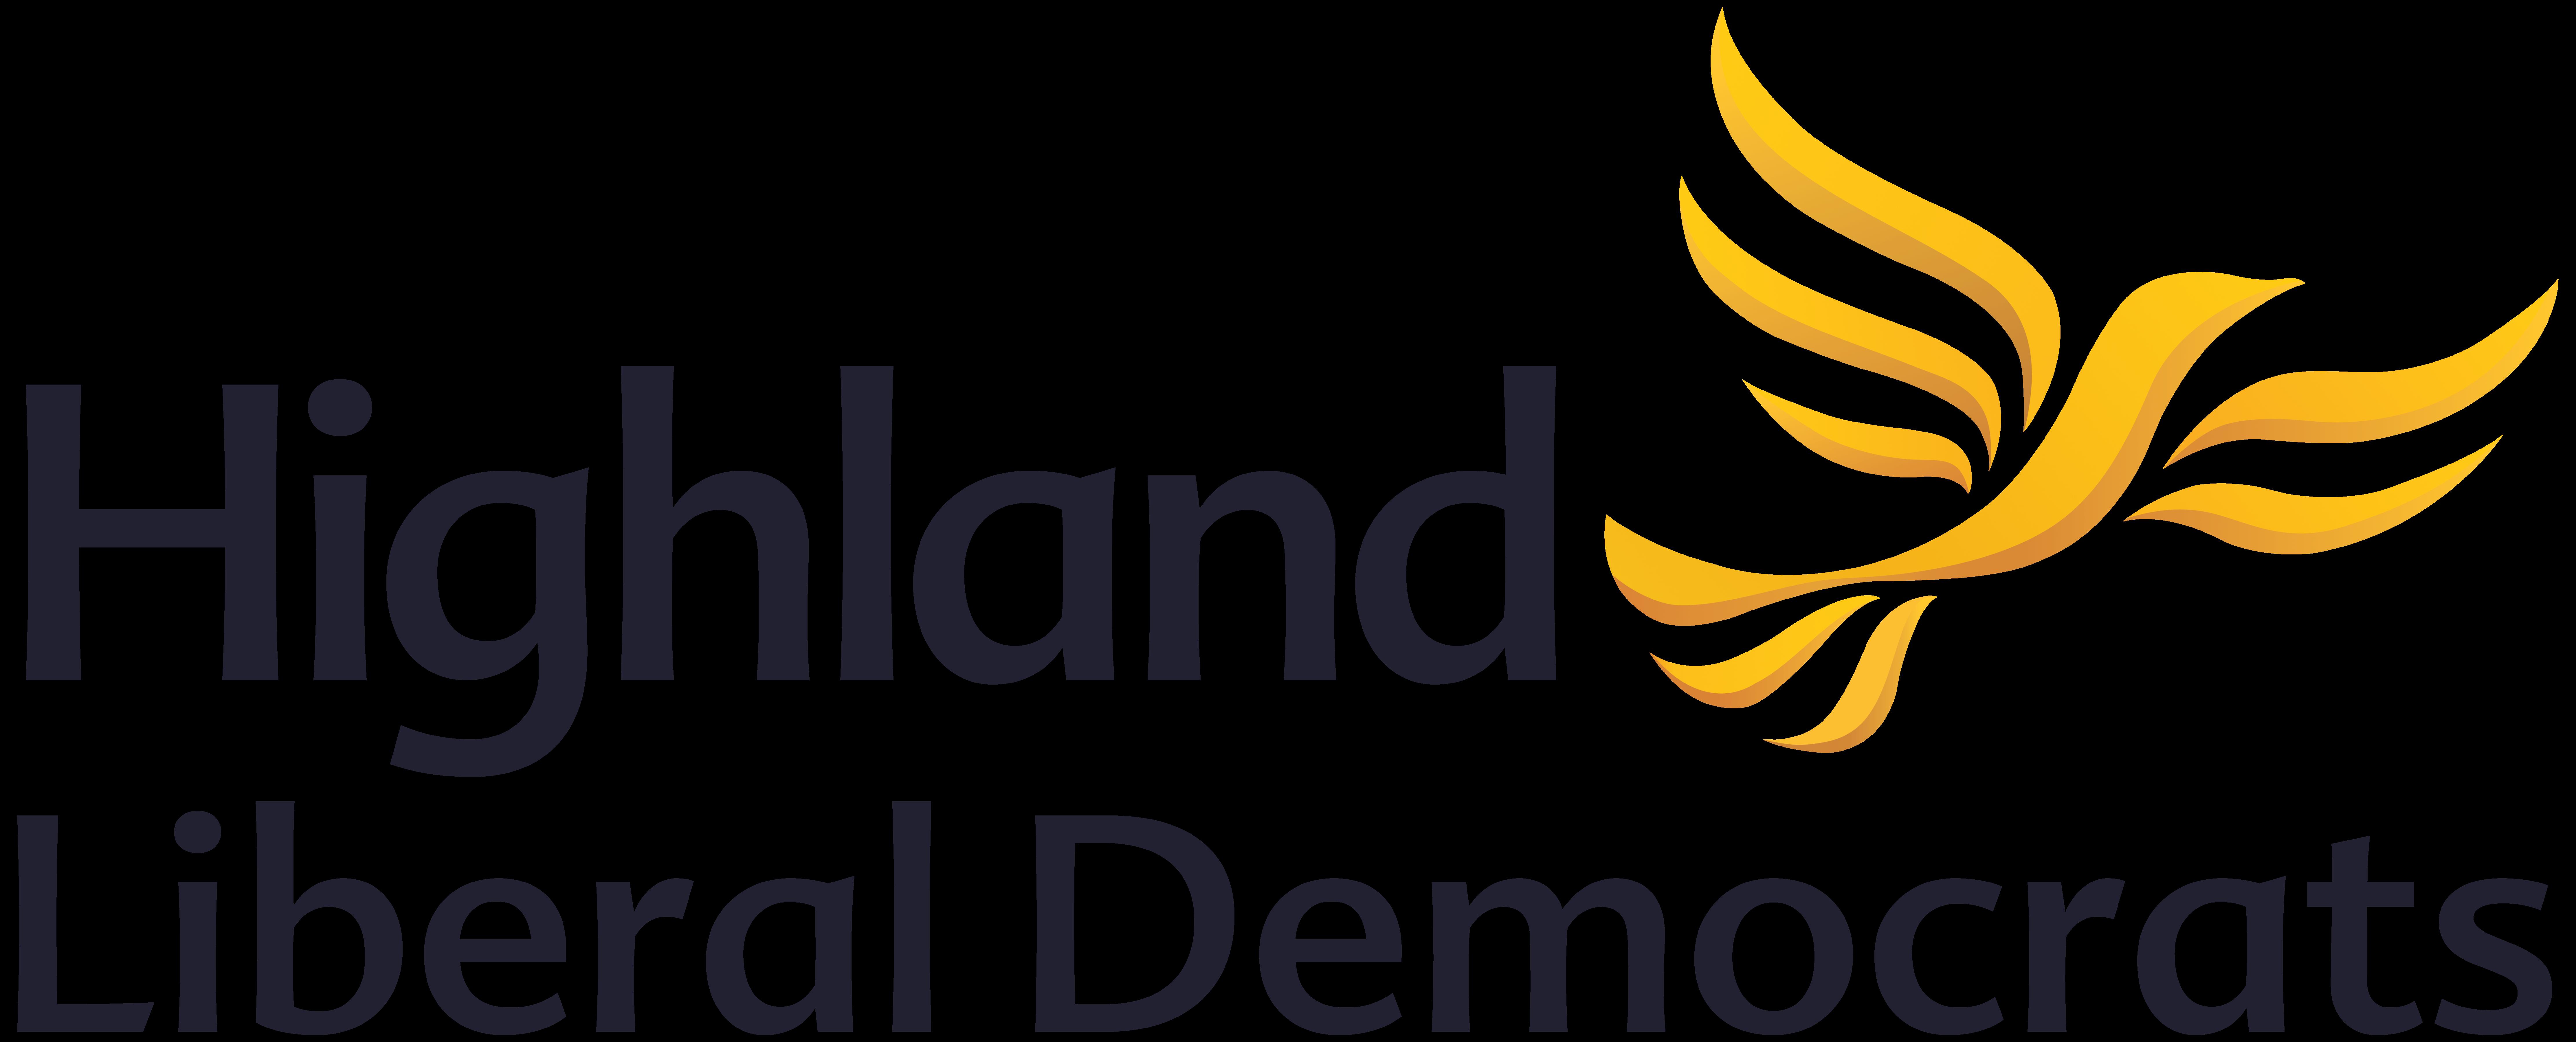 Highland Liberal Democrats